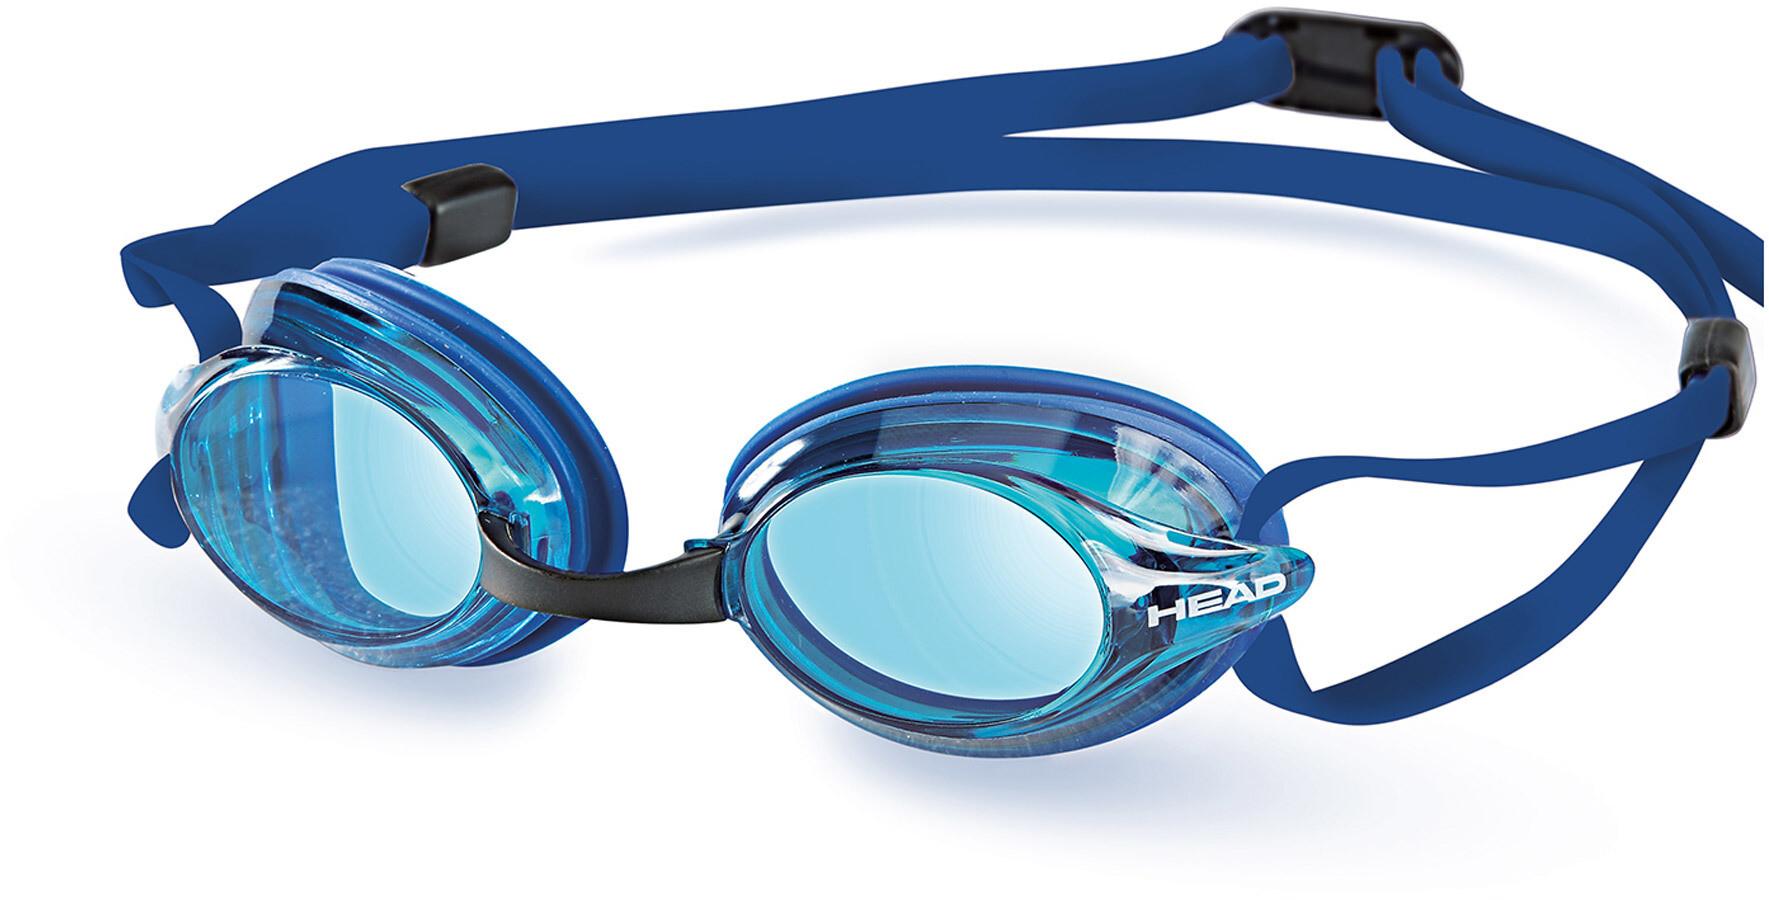 Head Venom Svømmebriller, blue-blue   Tri-beklædning